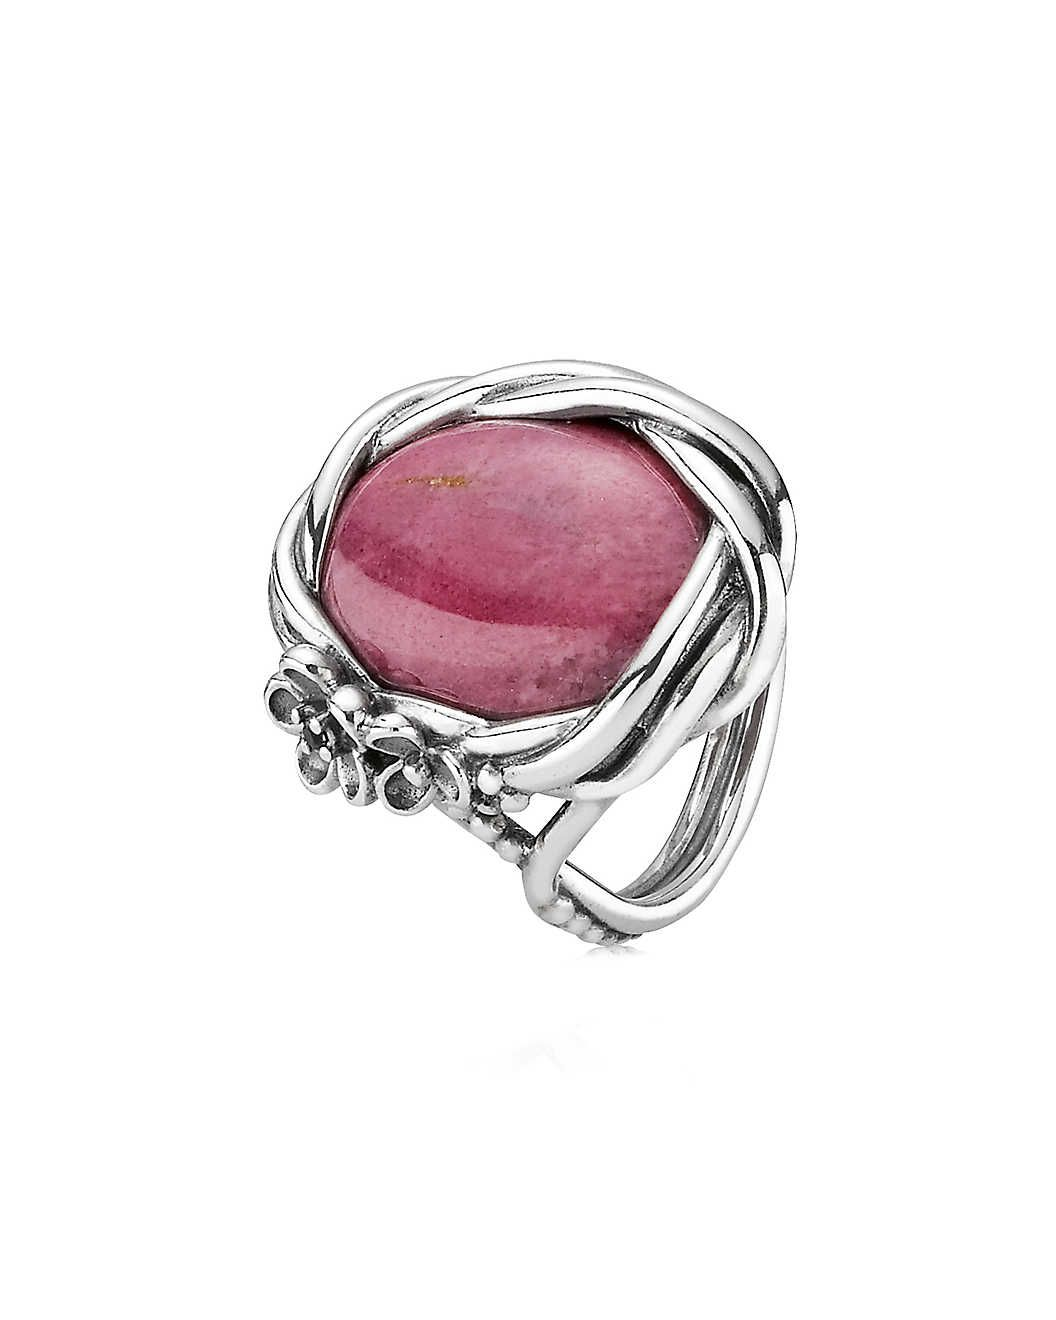 Spotted this PANDORA Silver Crystal Ring  on Rue La La. Shop (quickly!).